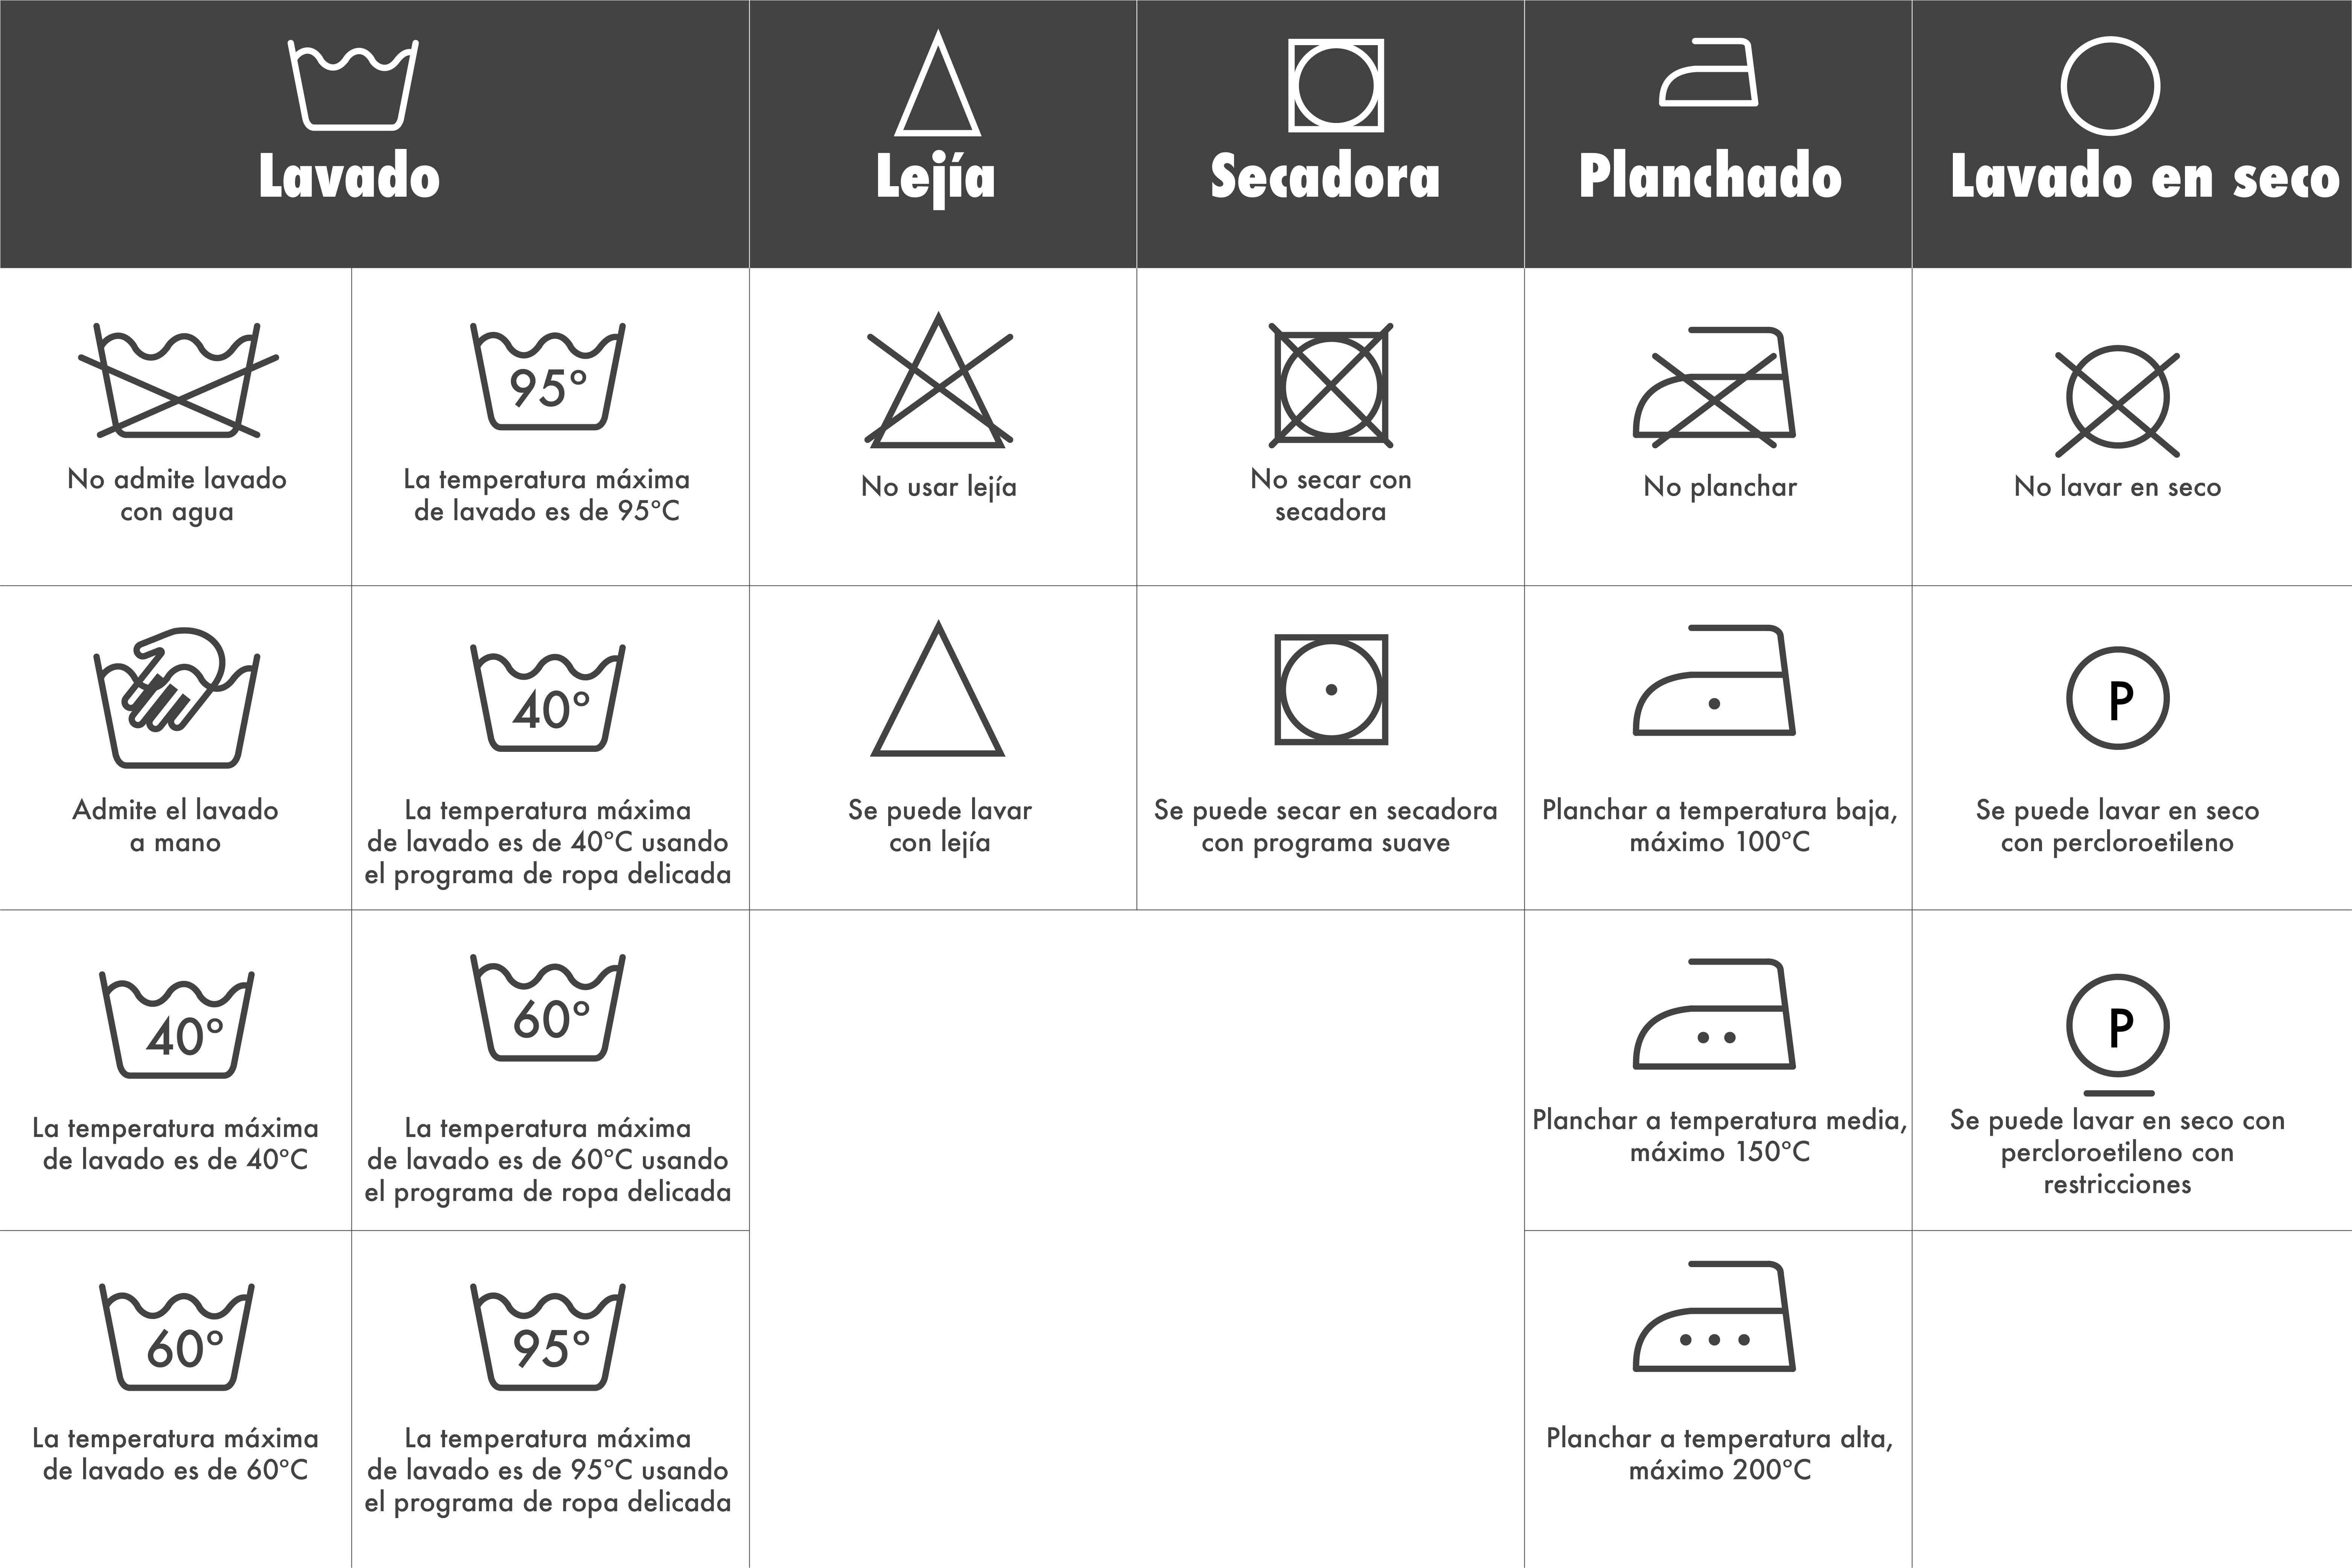 Simbolos de la etiqueta de un edredón de plumas